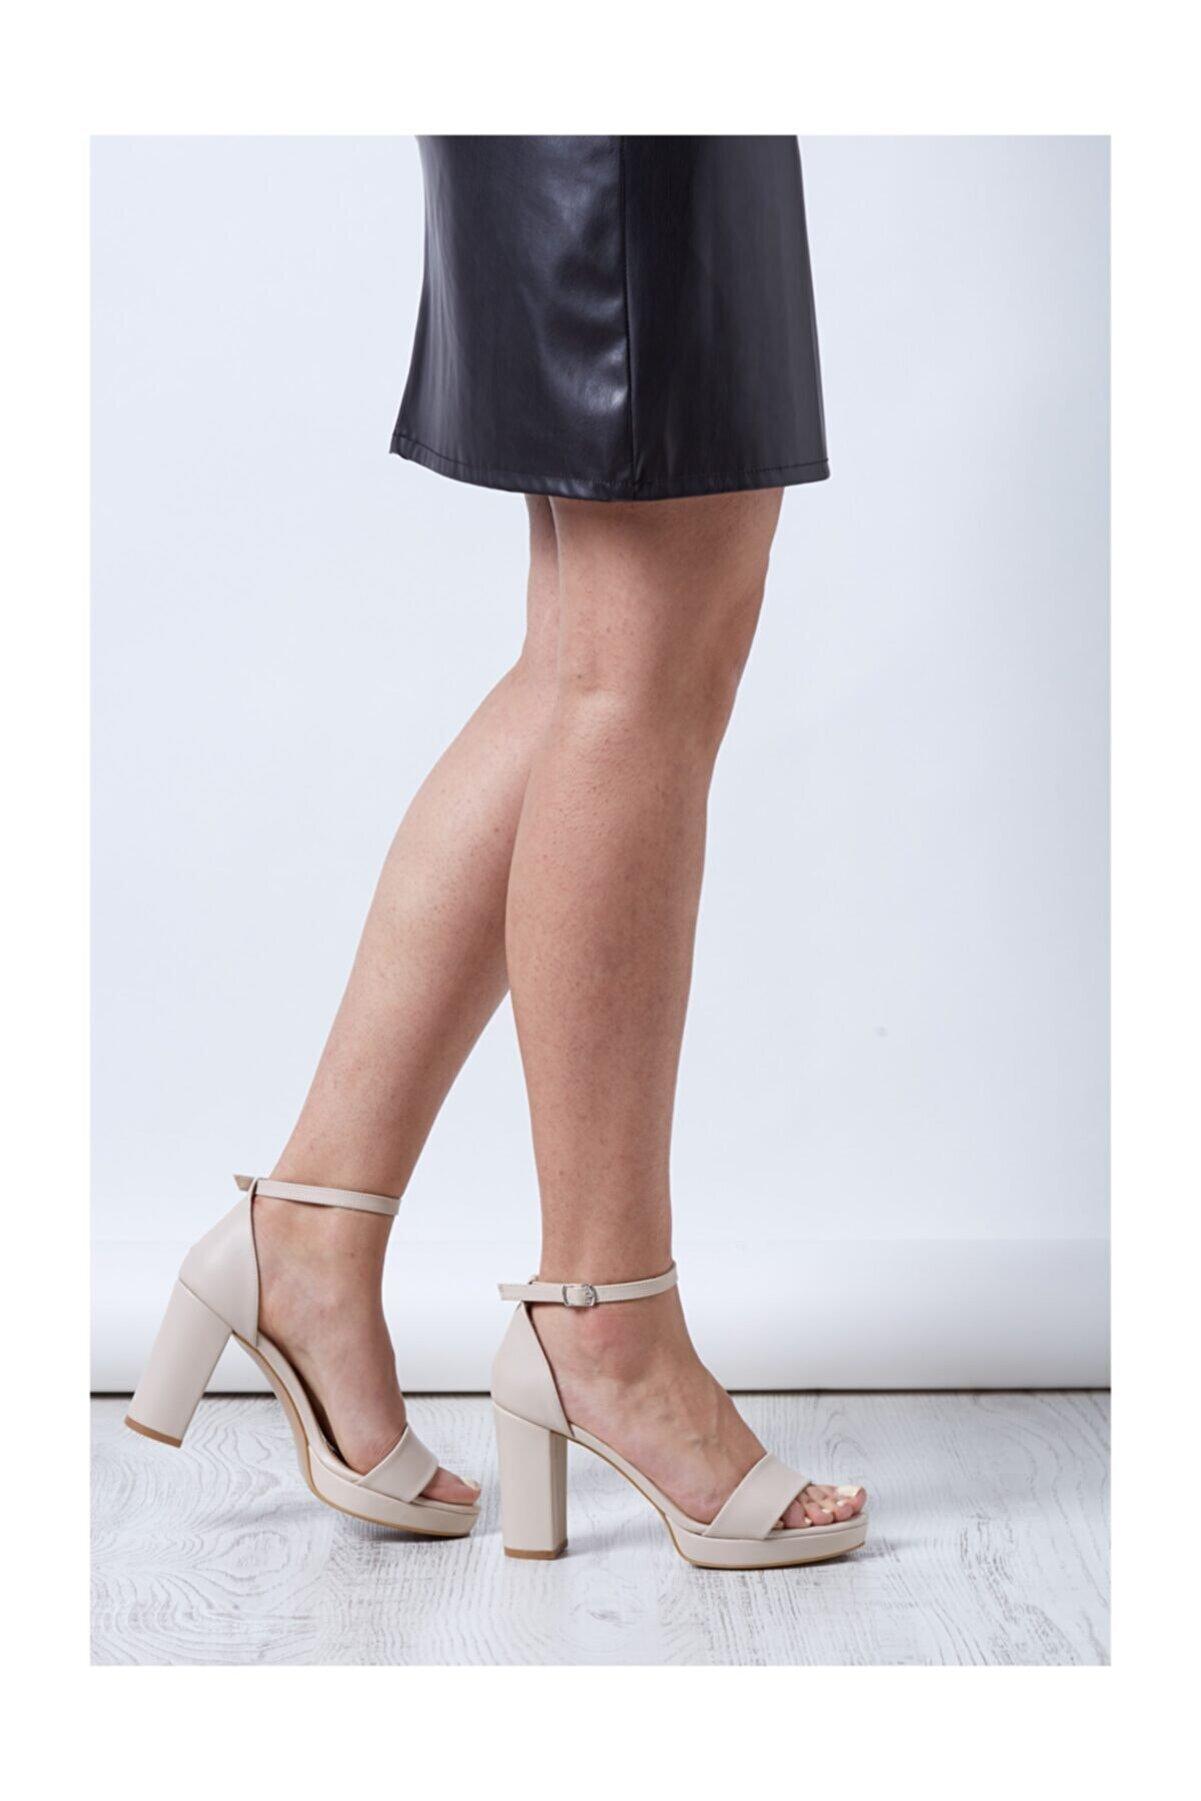 MİNAMİRA Kadın Nude Cilt  Platform Topuklu Ayakkabı Romance